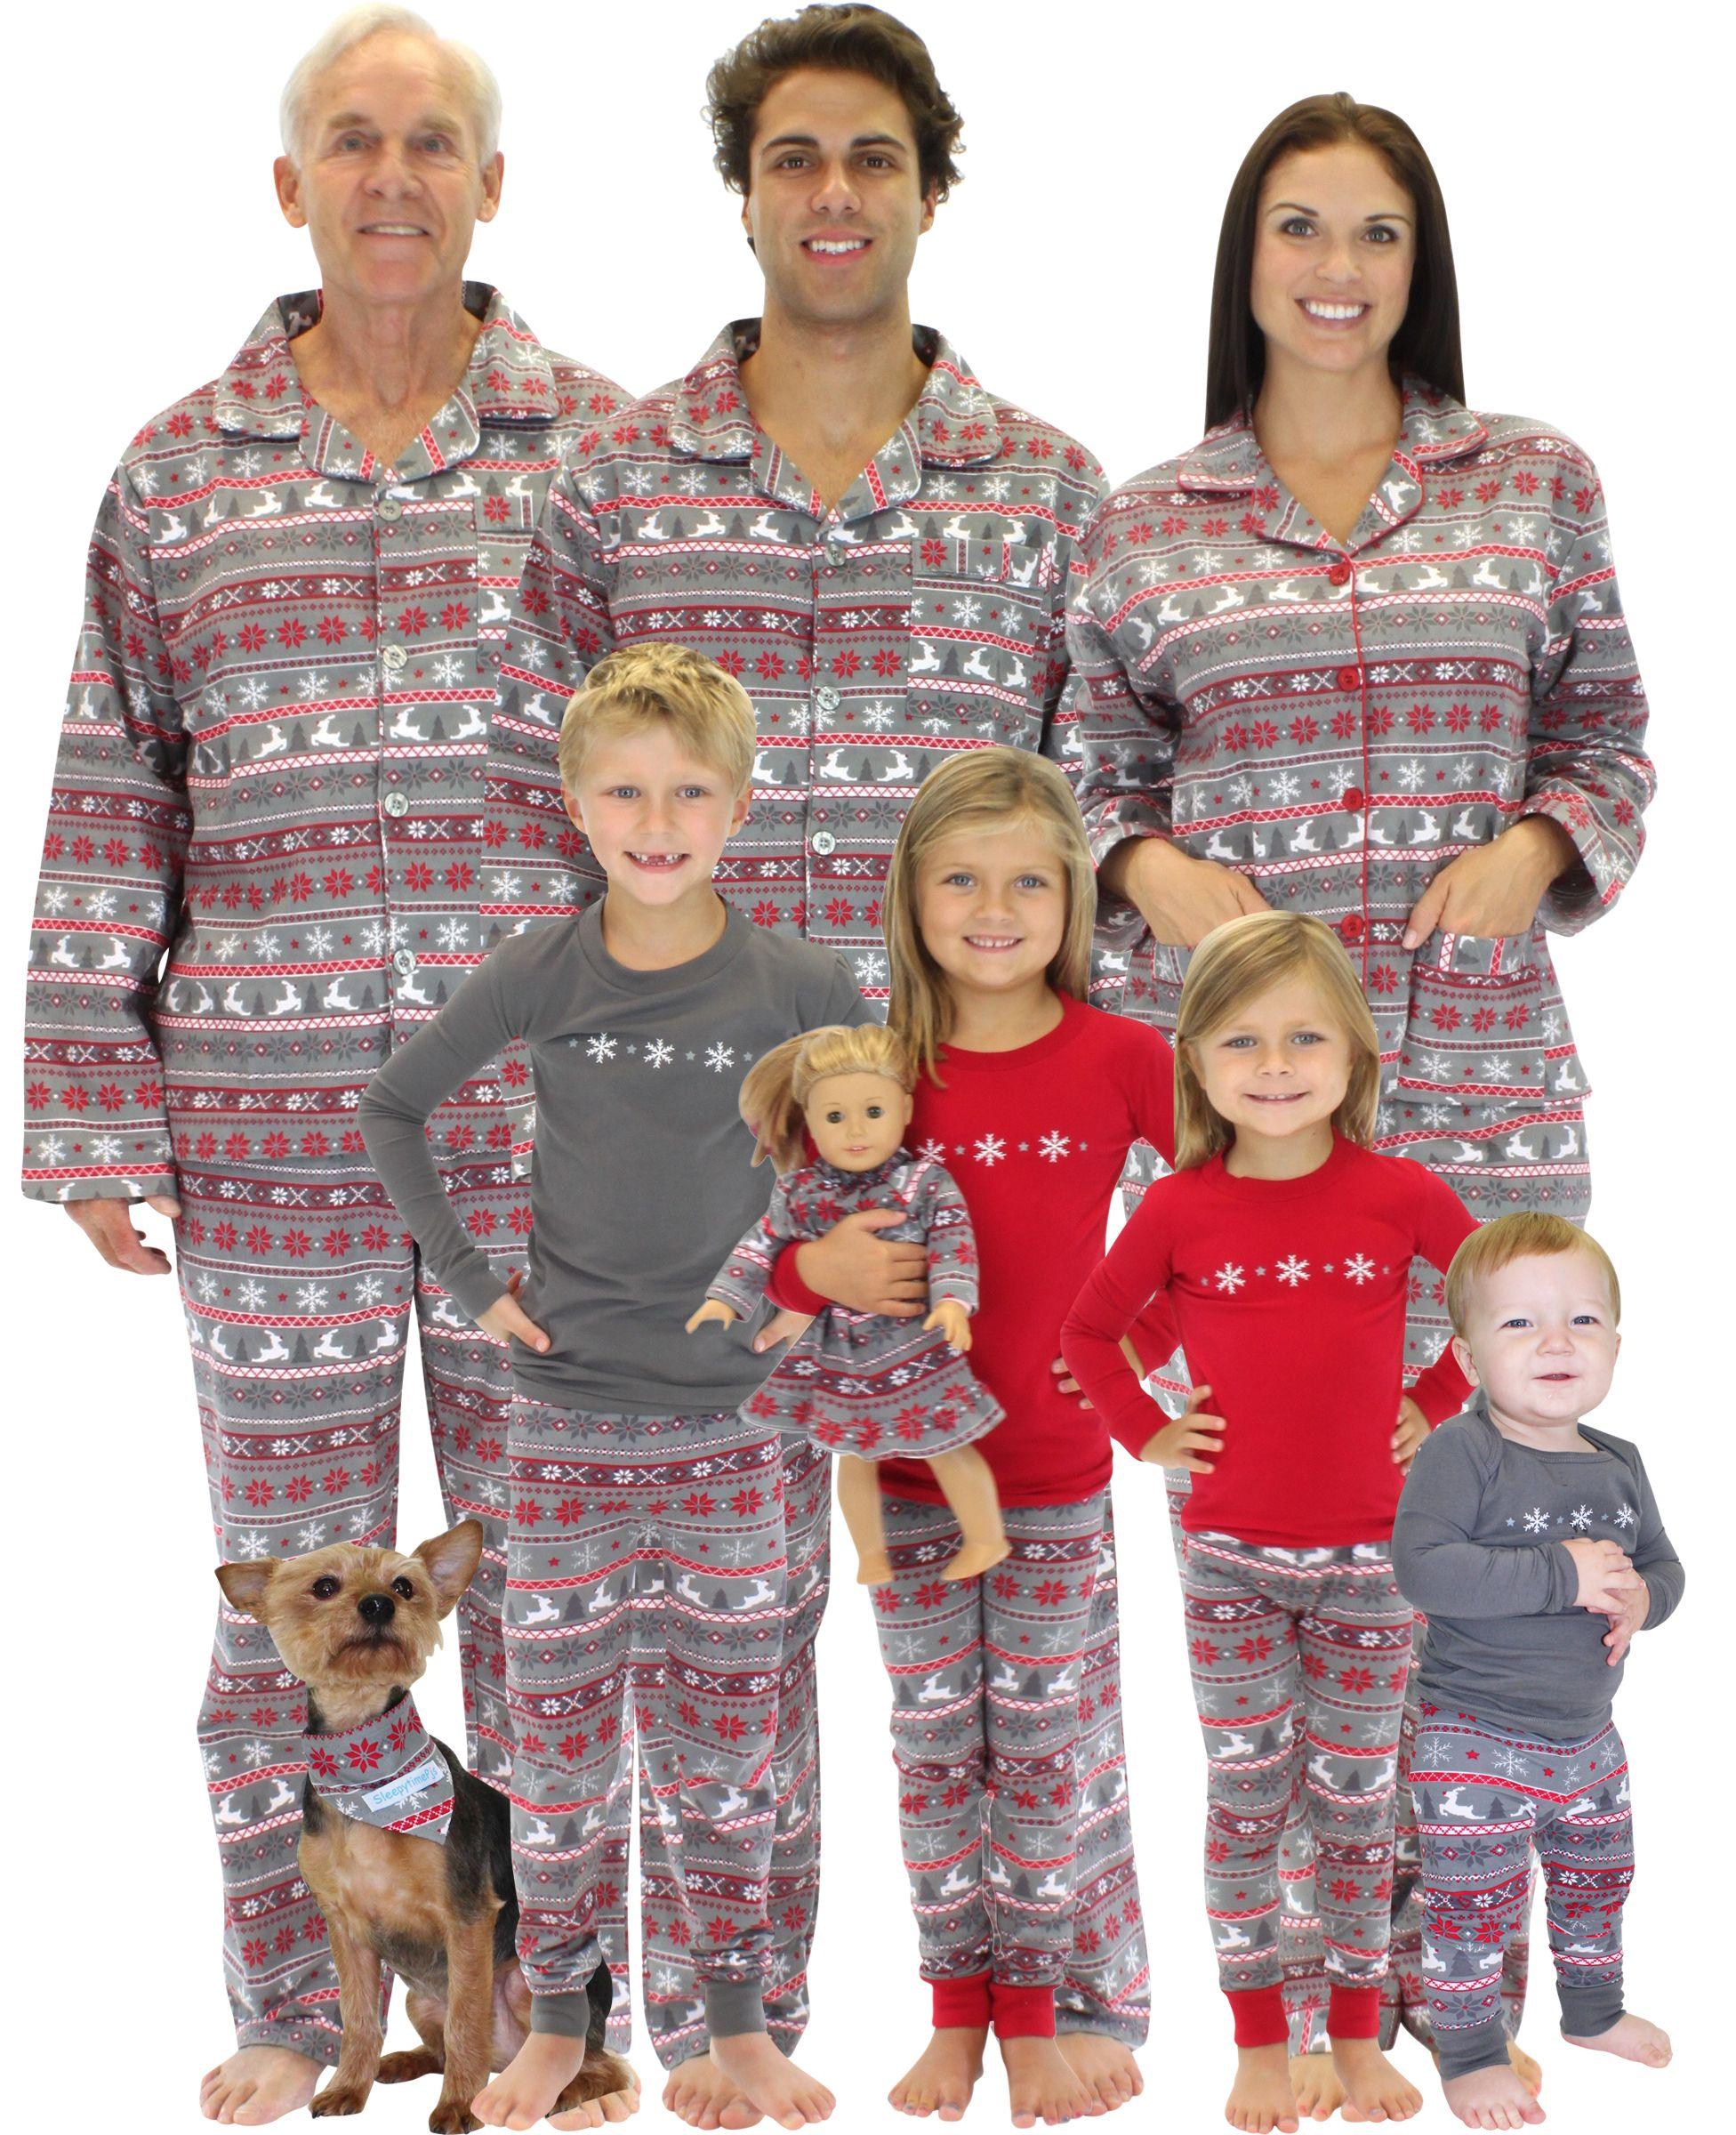 Matching Family Pajamas - A Holiday Tradition and Hot Christmas ... 4409e2b8000c